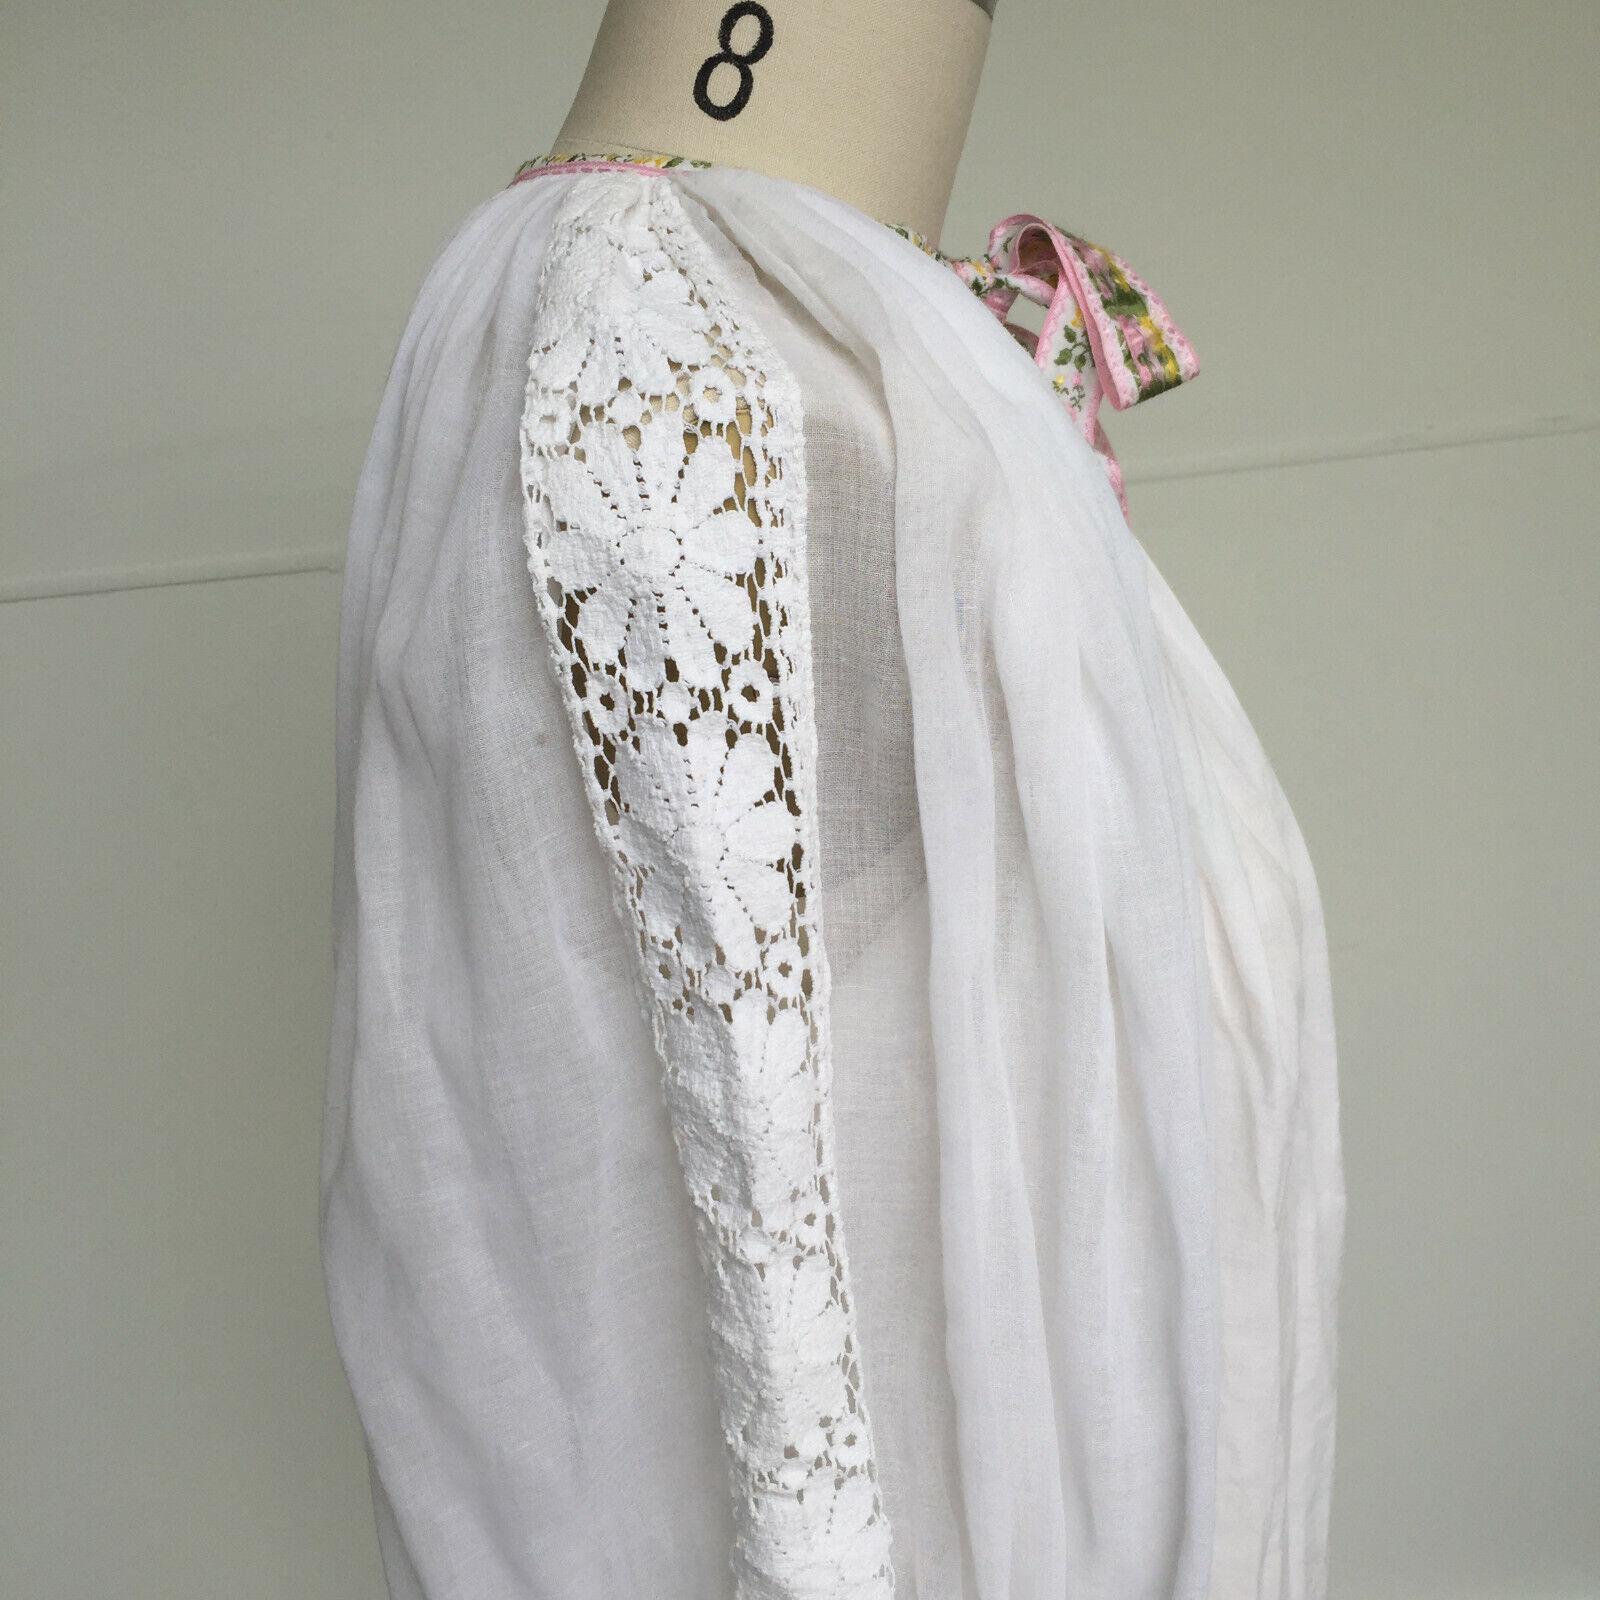 VTG 1970s Hungarian Handmade Textured Boho-Chic P… - image 3